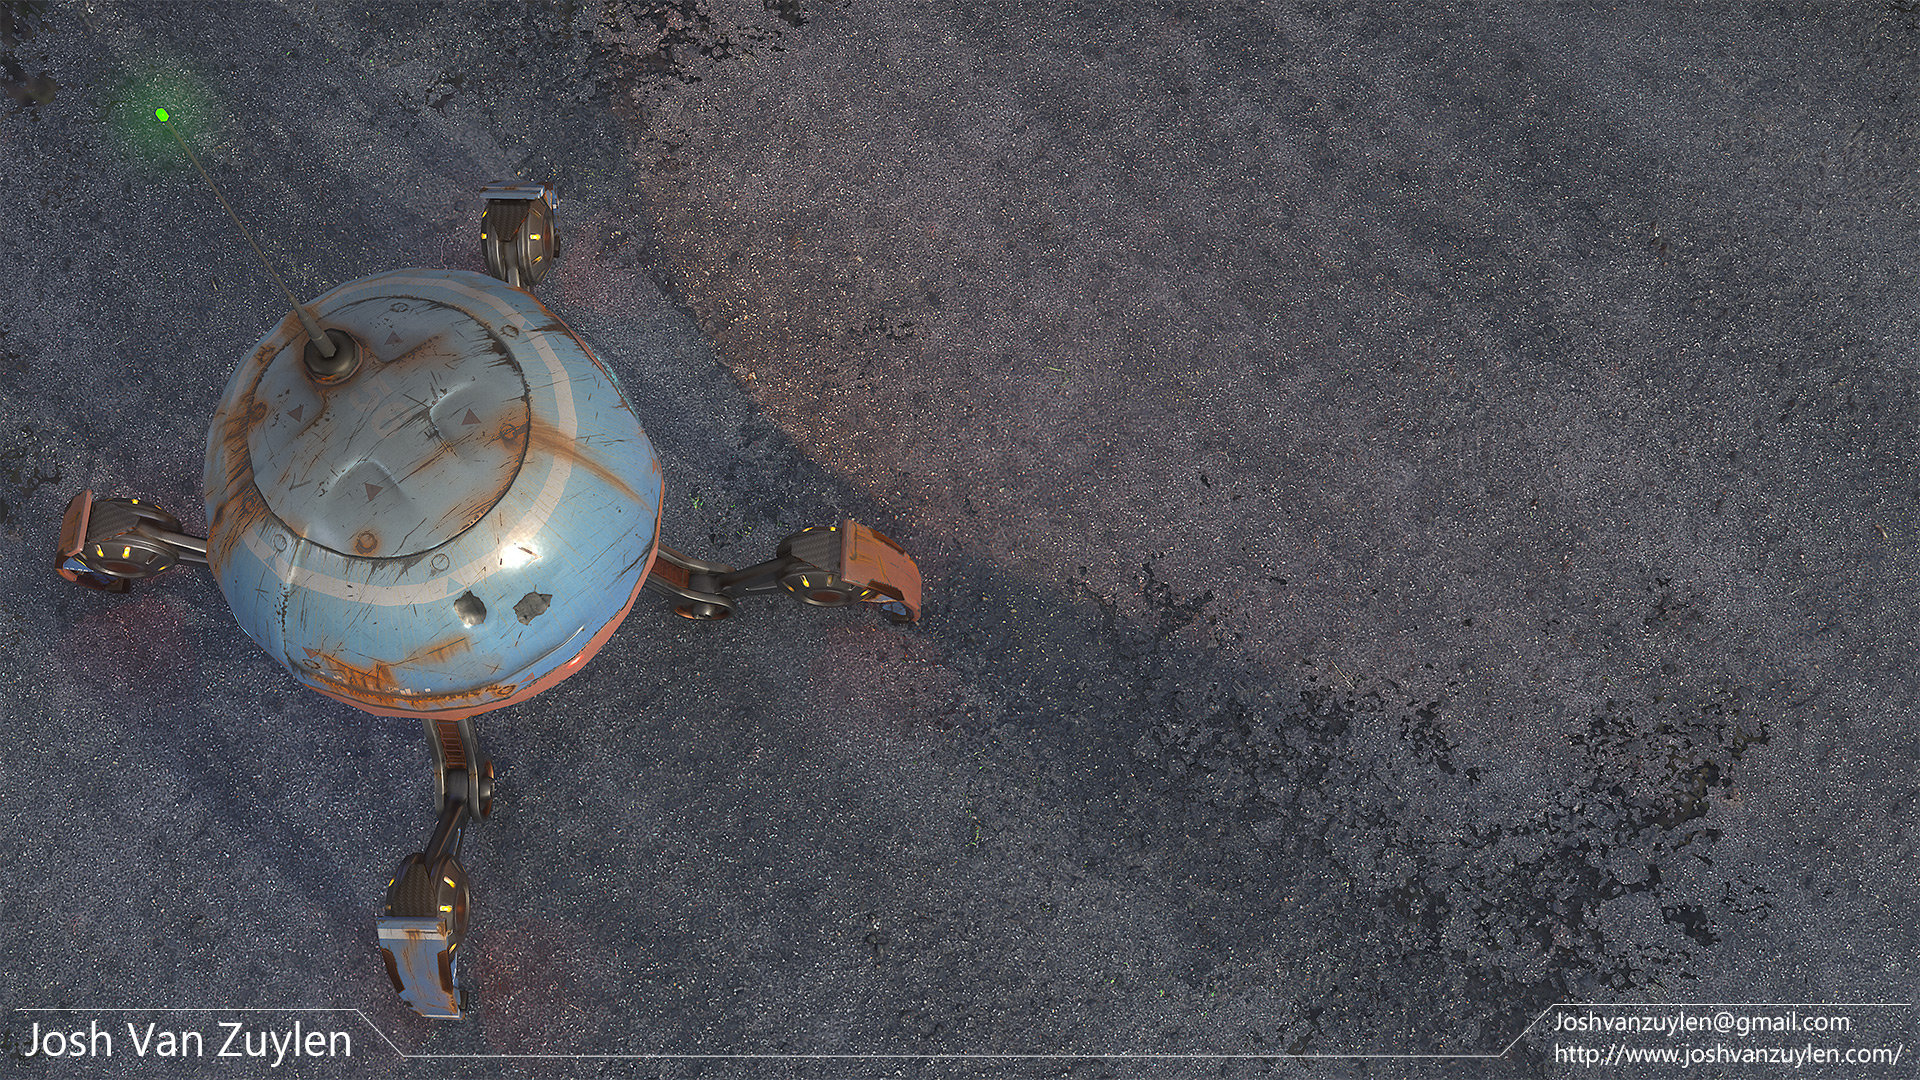 josh-van-zuylen-little-robot-final-5.jpg?1436955588